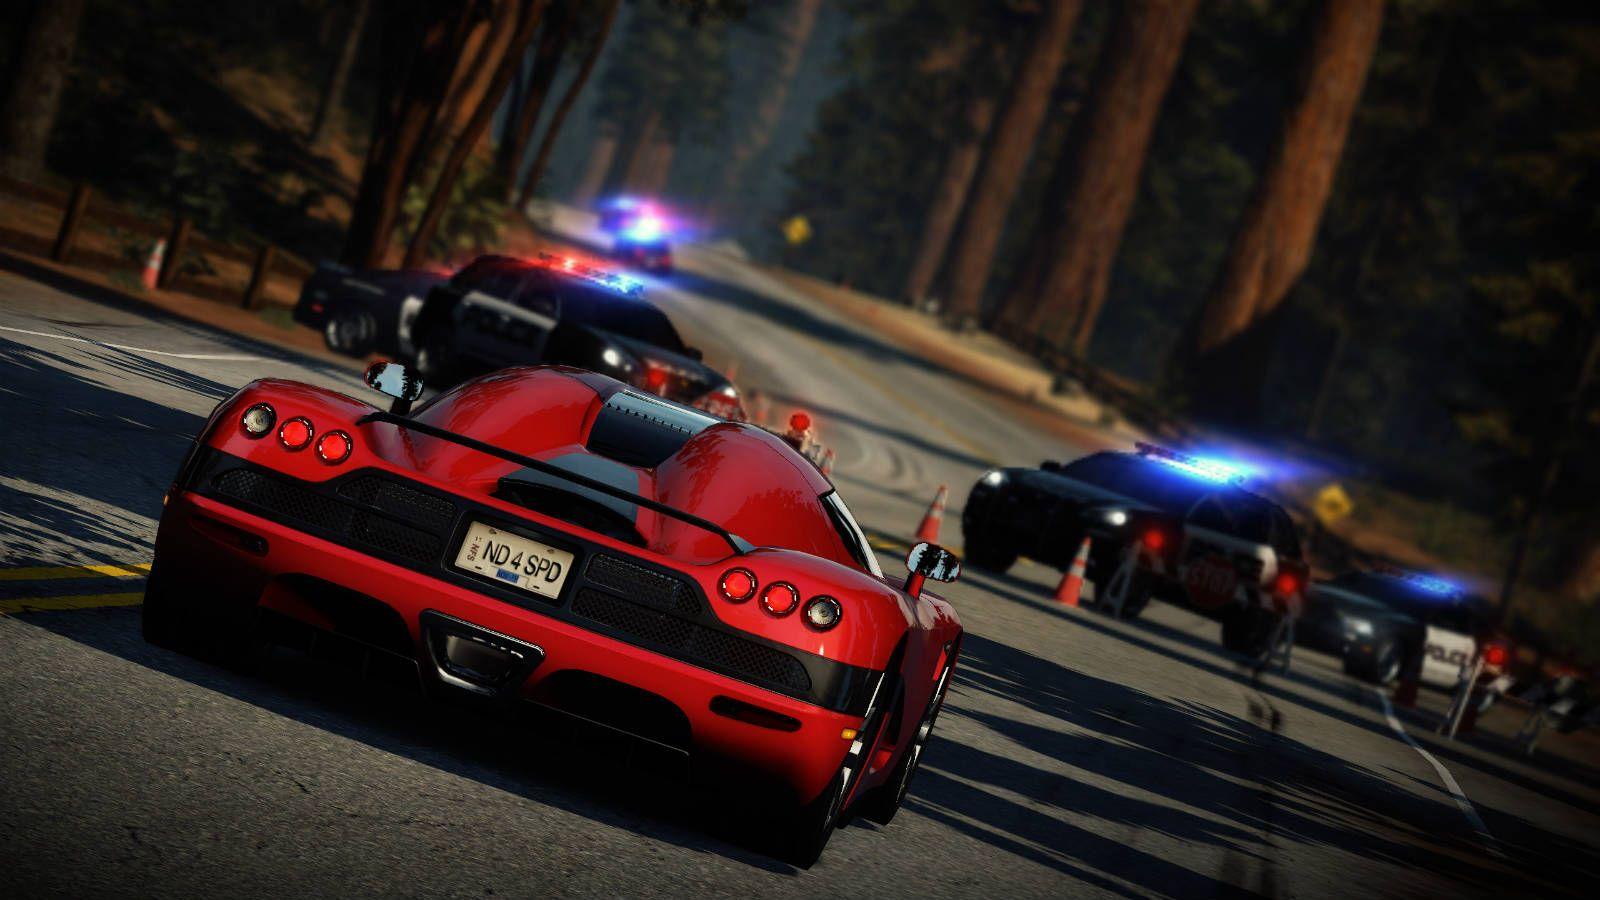 Обои hp, hot pursuit, Need for speed hot pursuit. Игры foto 17